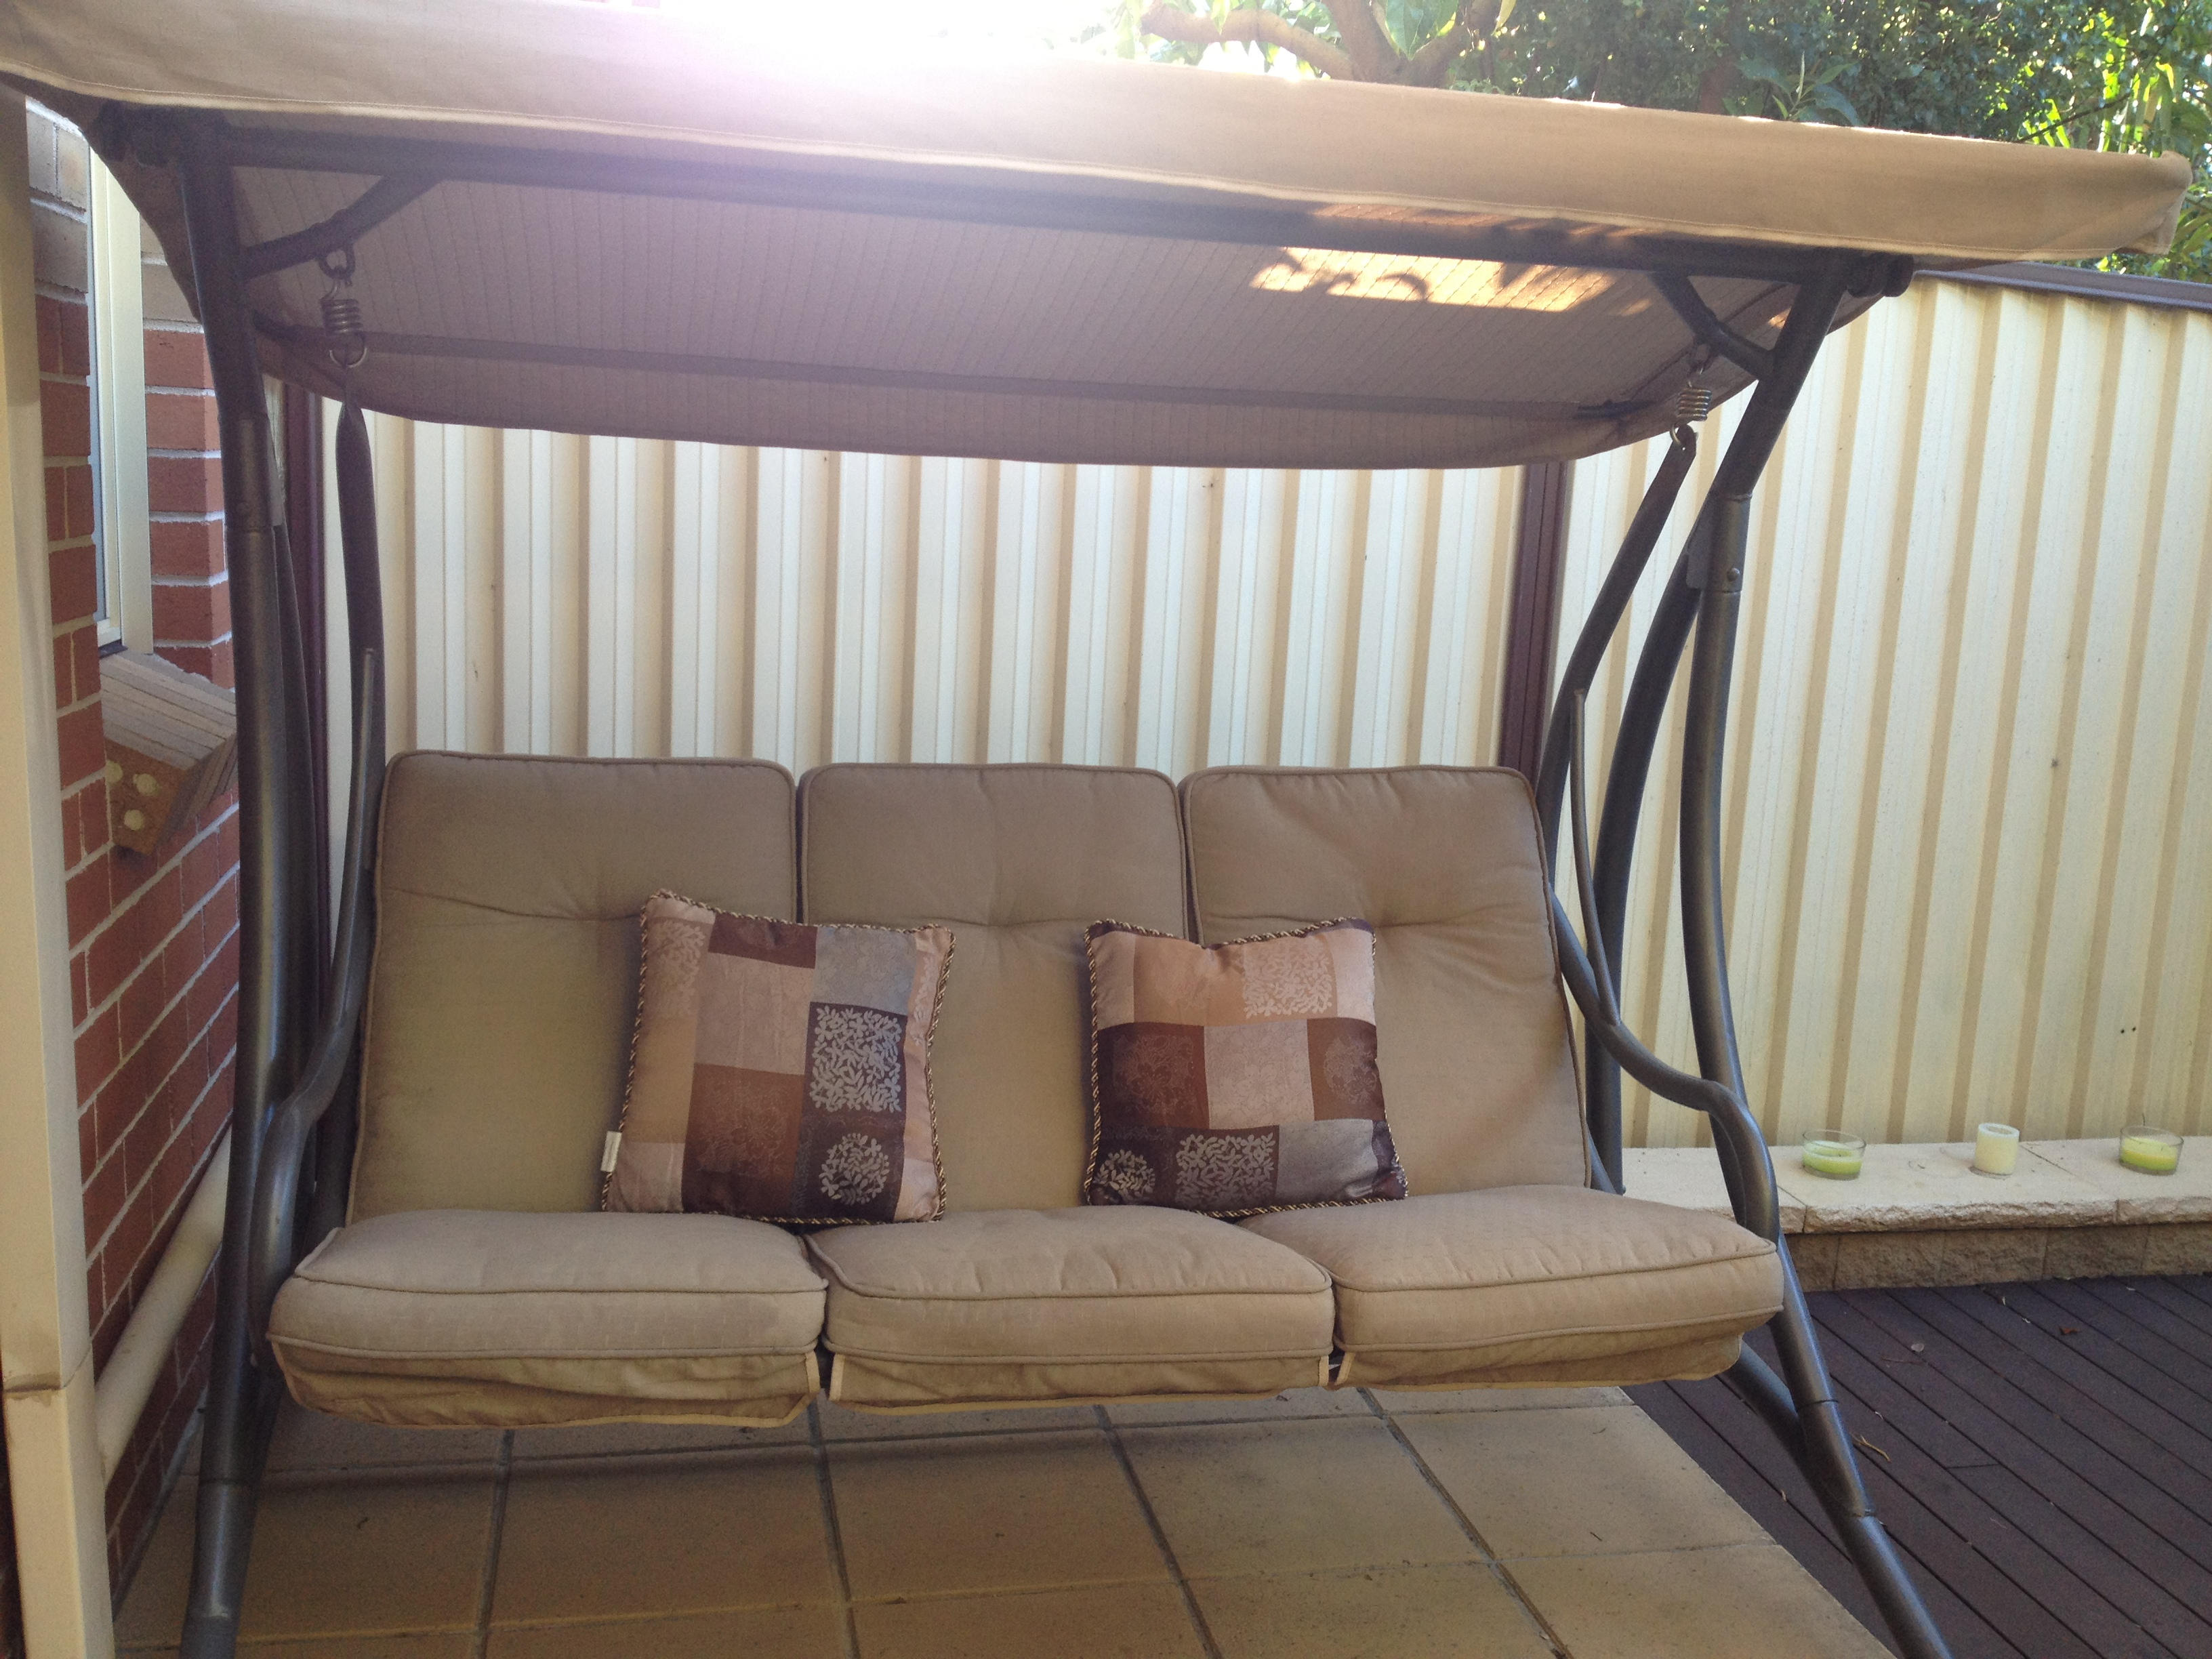 swing chair bunnings curtis dark brown leather recliner club design littleprince68